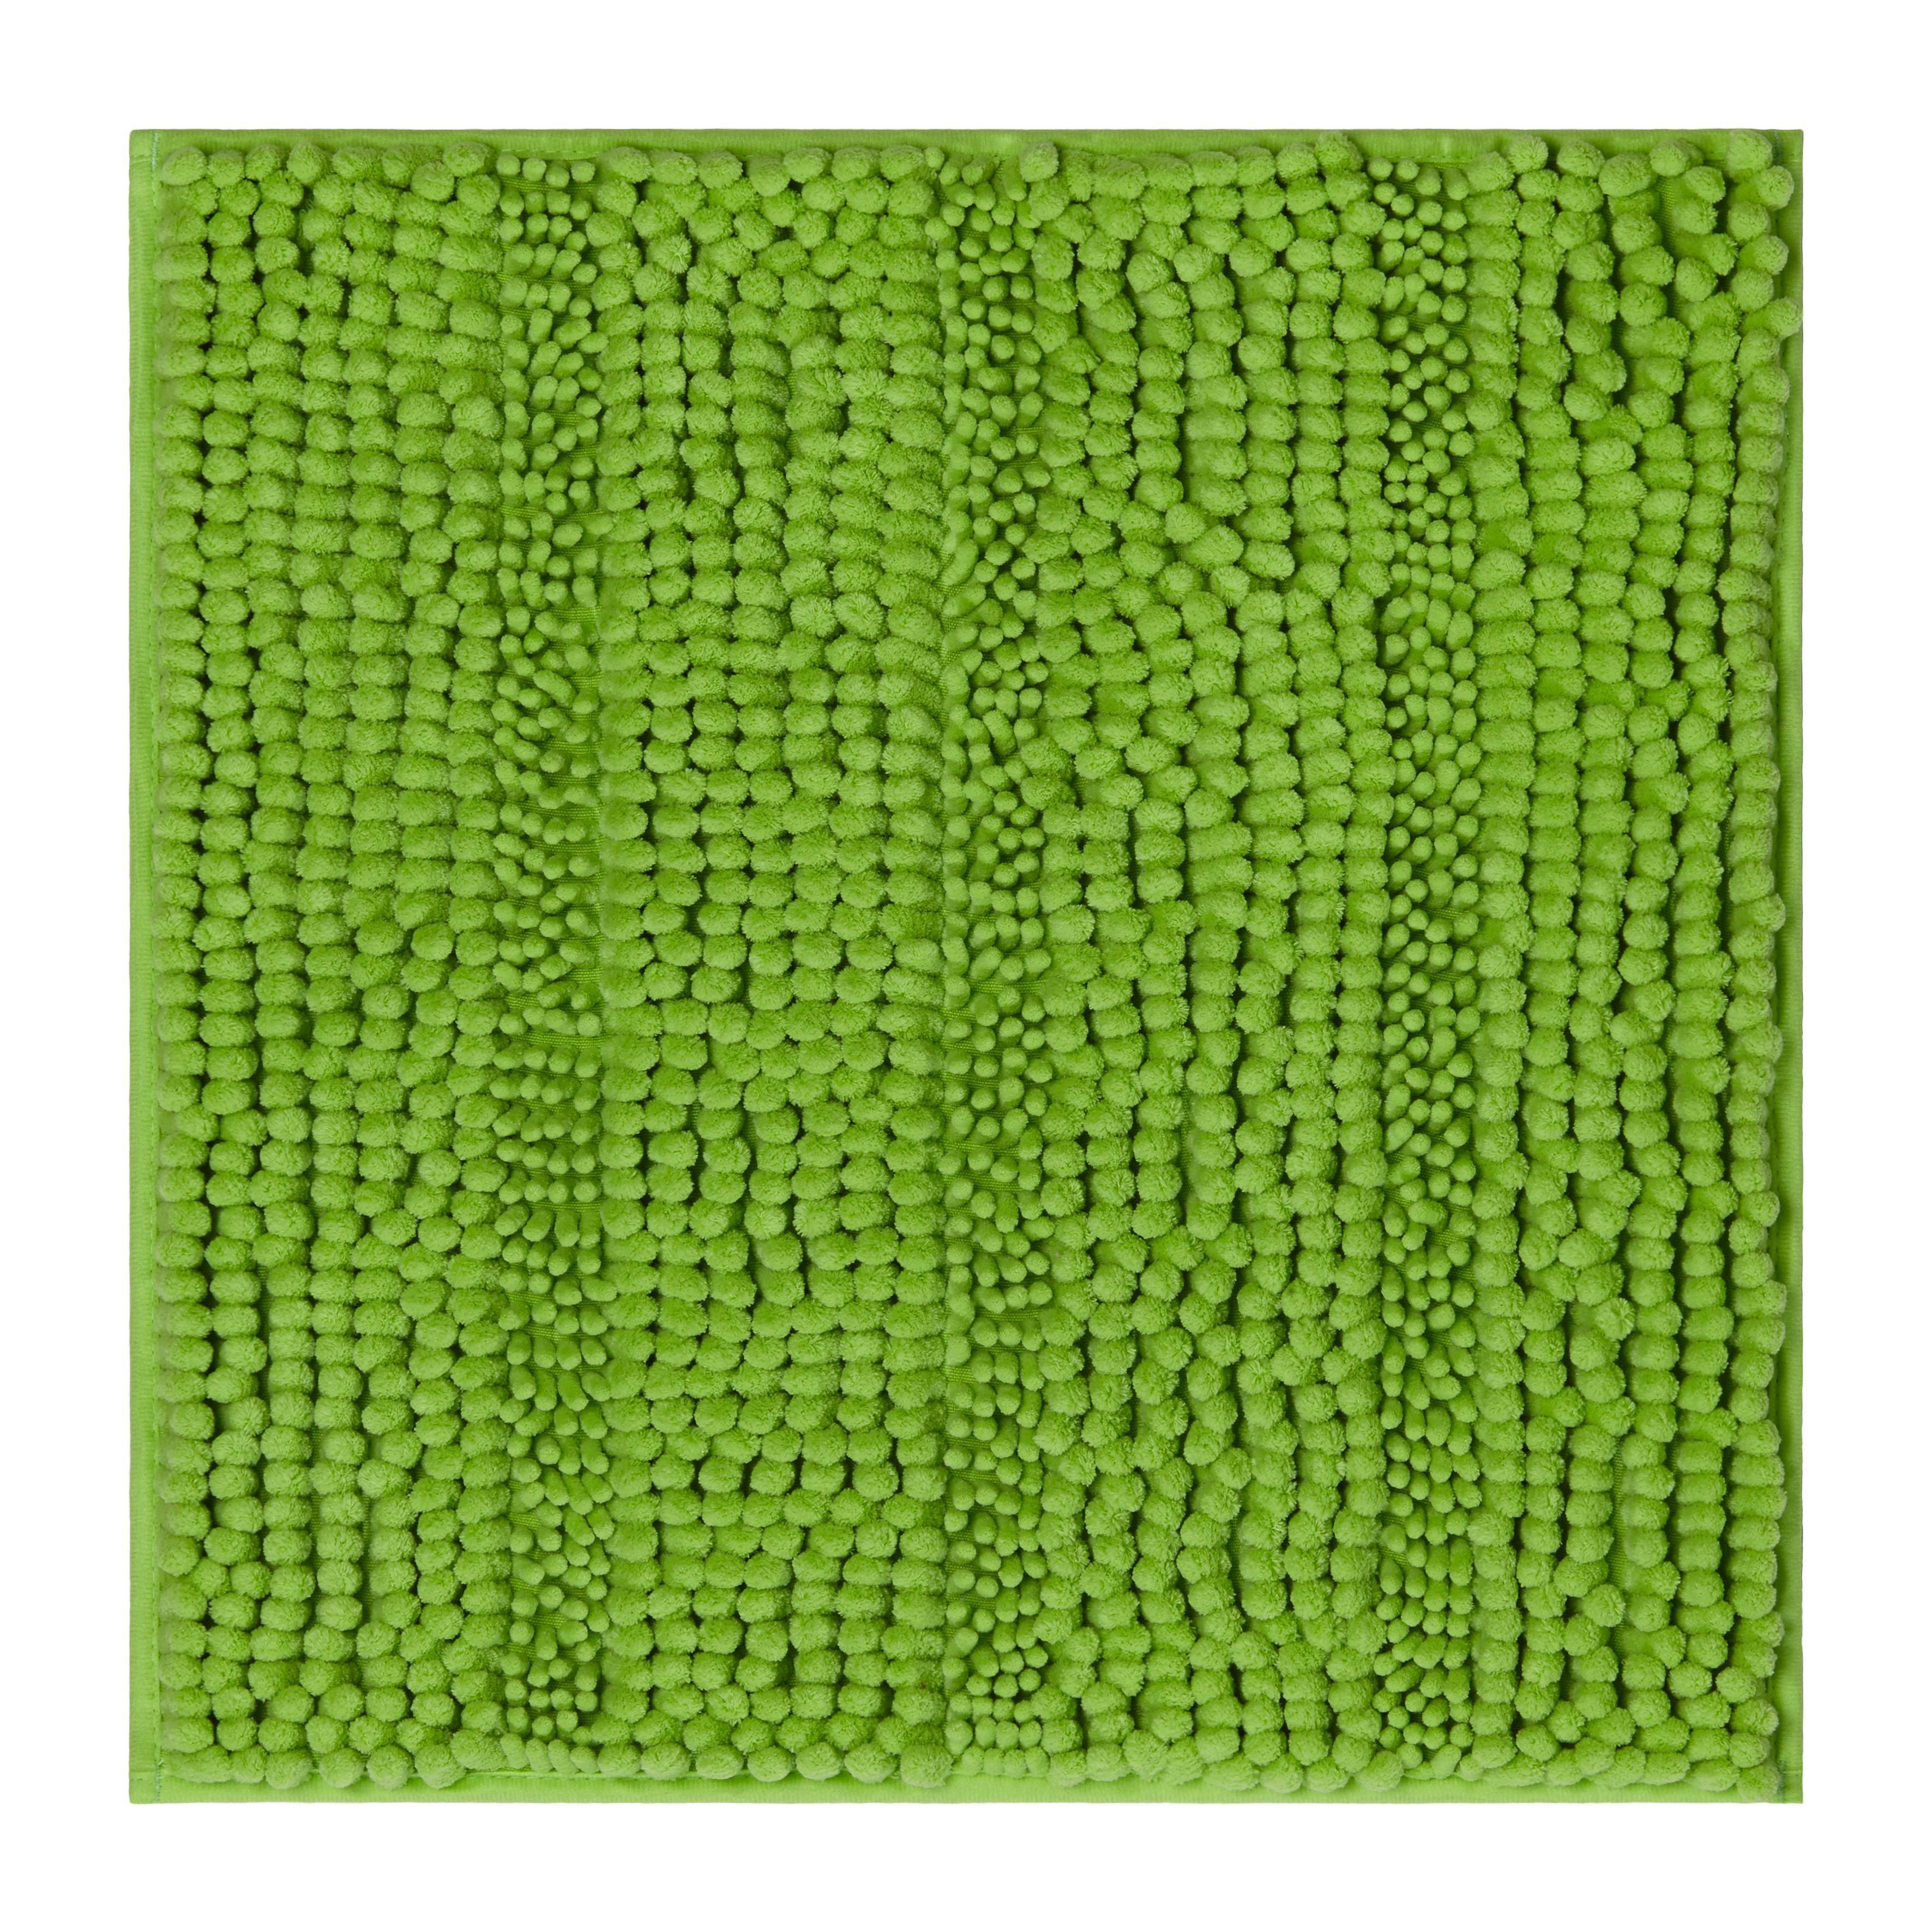 Badematte Uwe ca. 50x50cm - Grün, Textil (50/50cm) - MÖMAX modern living